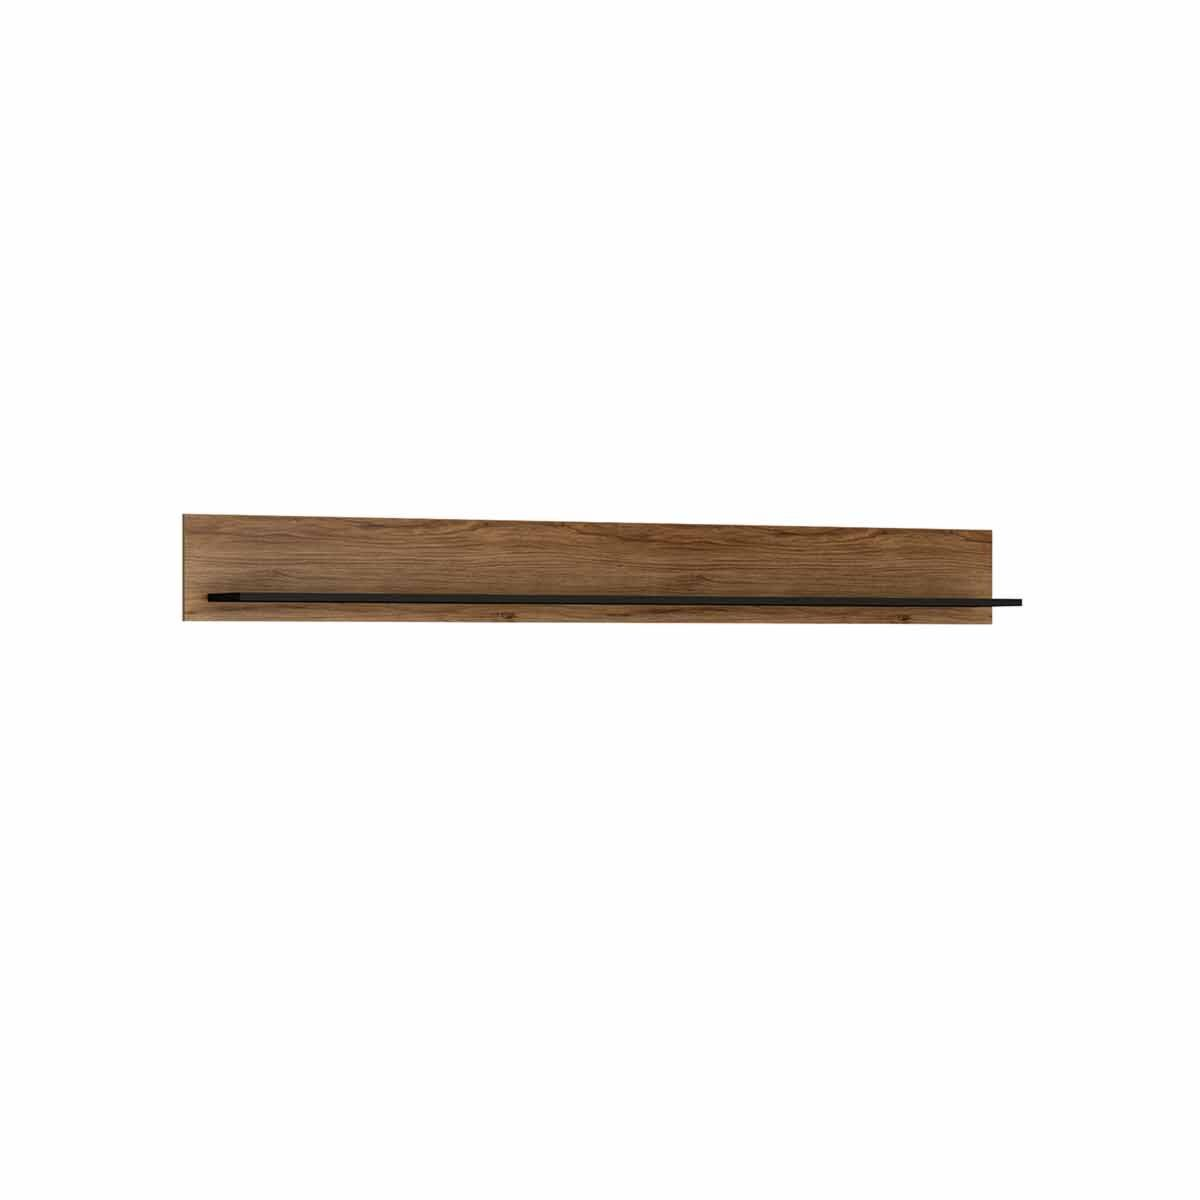 Brolo Wall Shelf 197cm